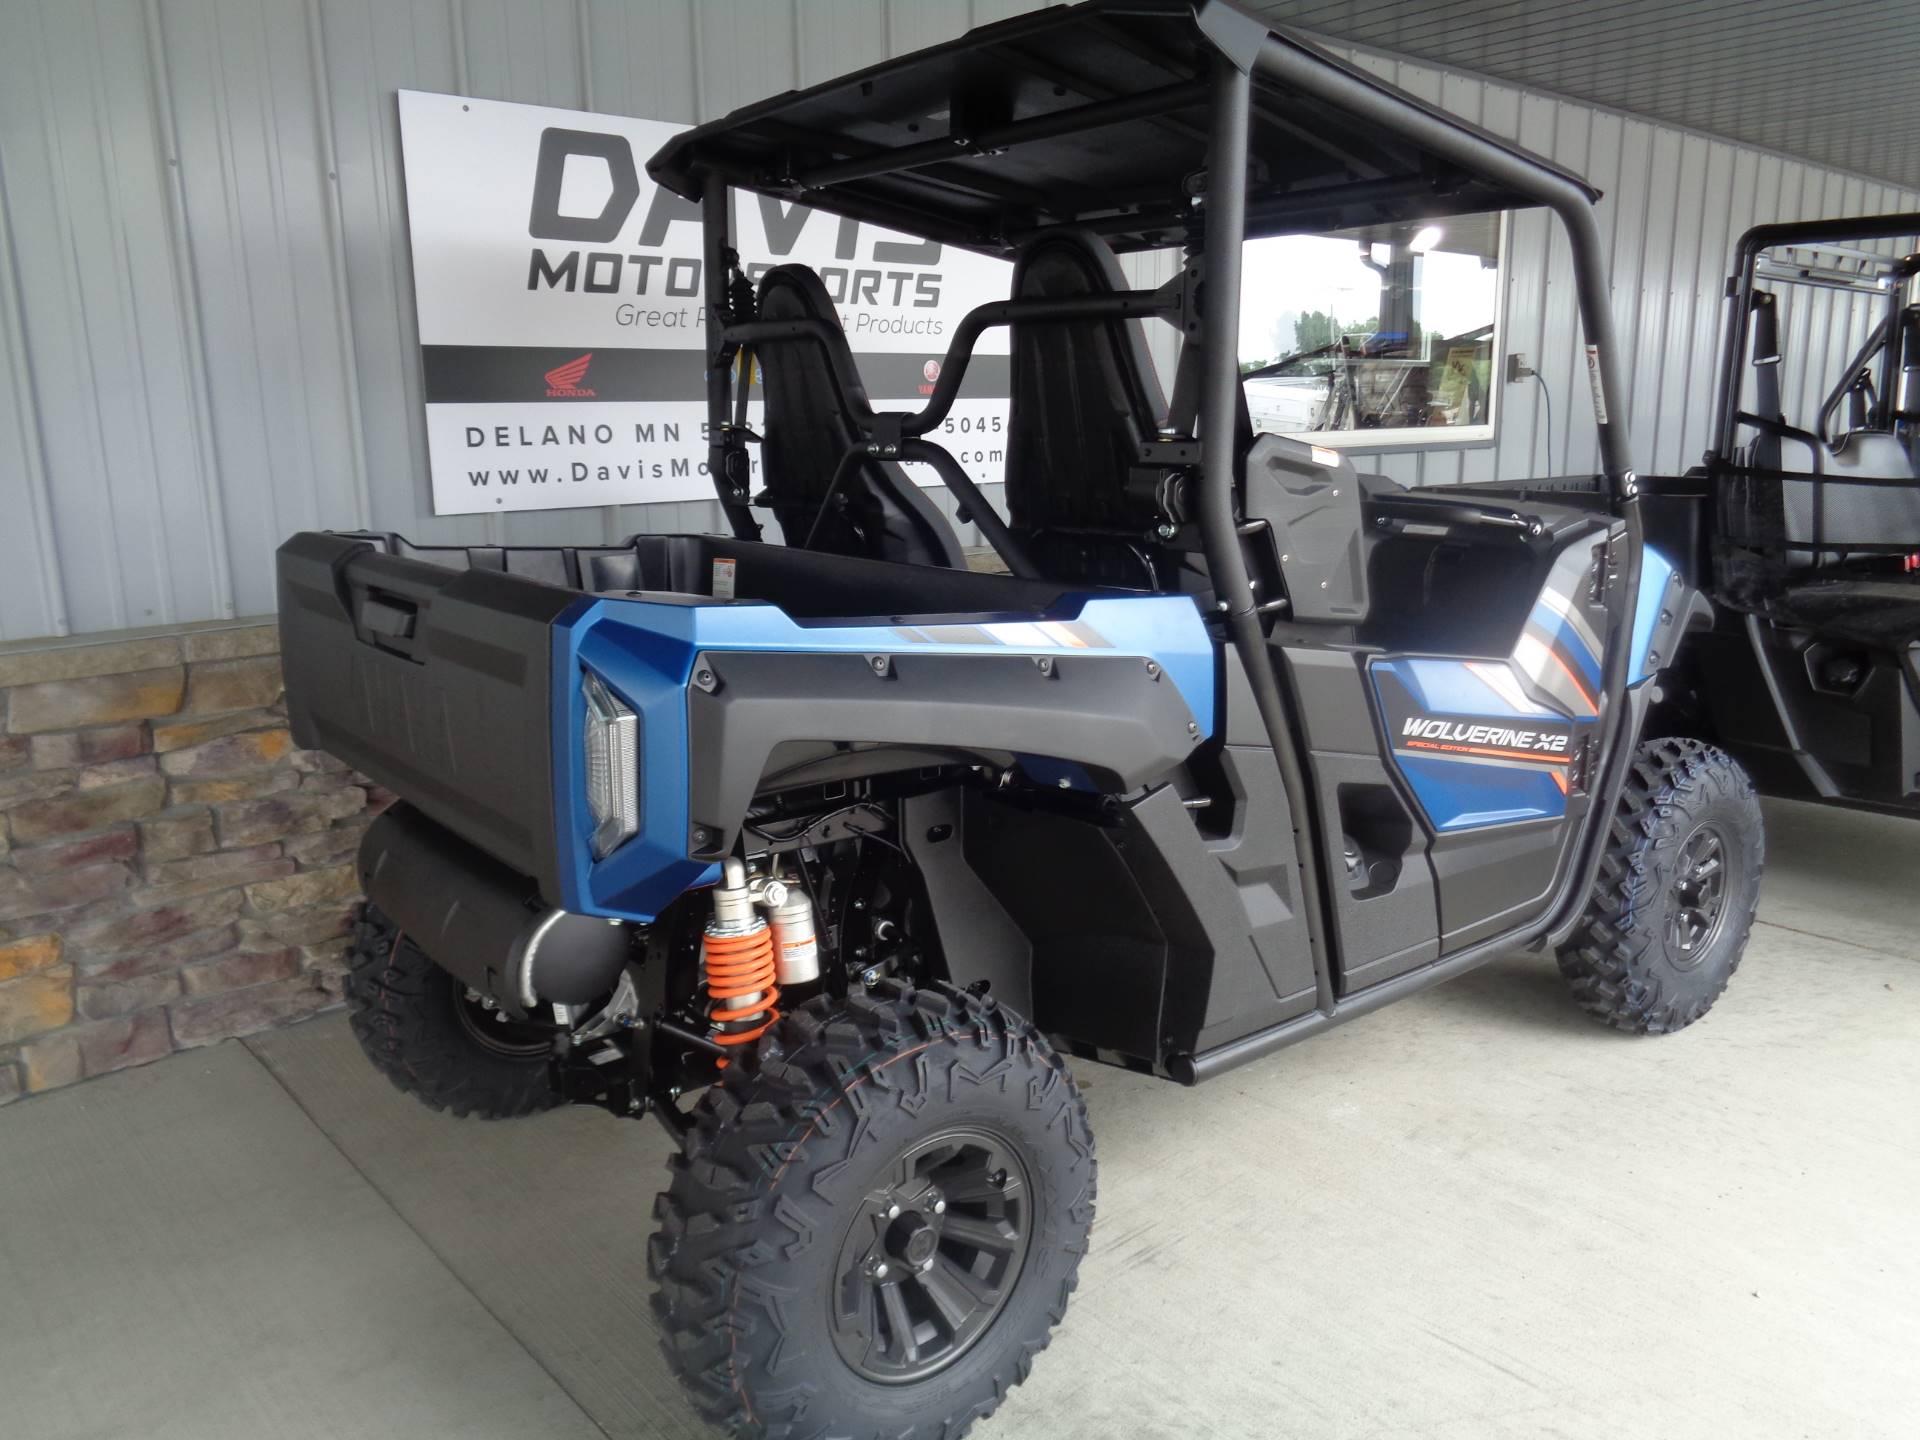 2019 Yamaha Wolverine X2 R Spec Se In Delano Minnesota